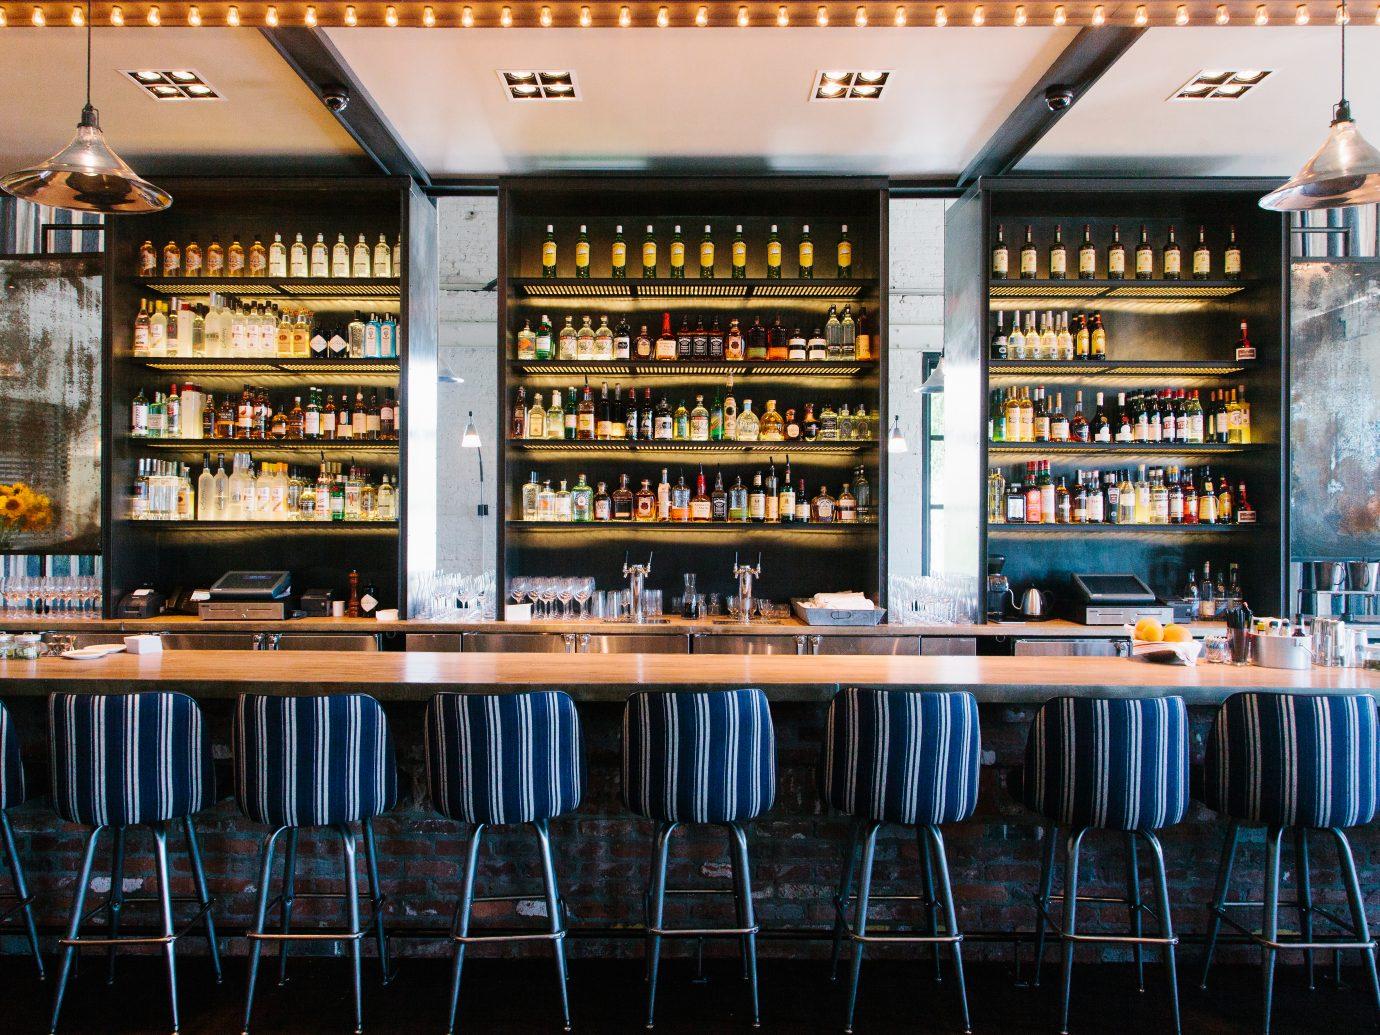 Bar with numerous bottles on shelf